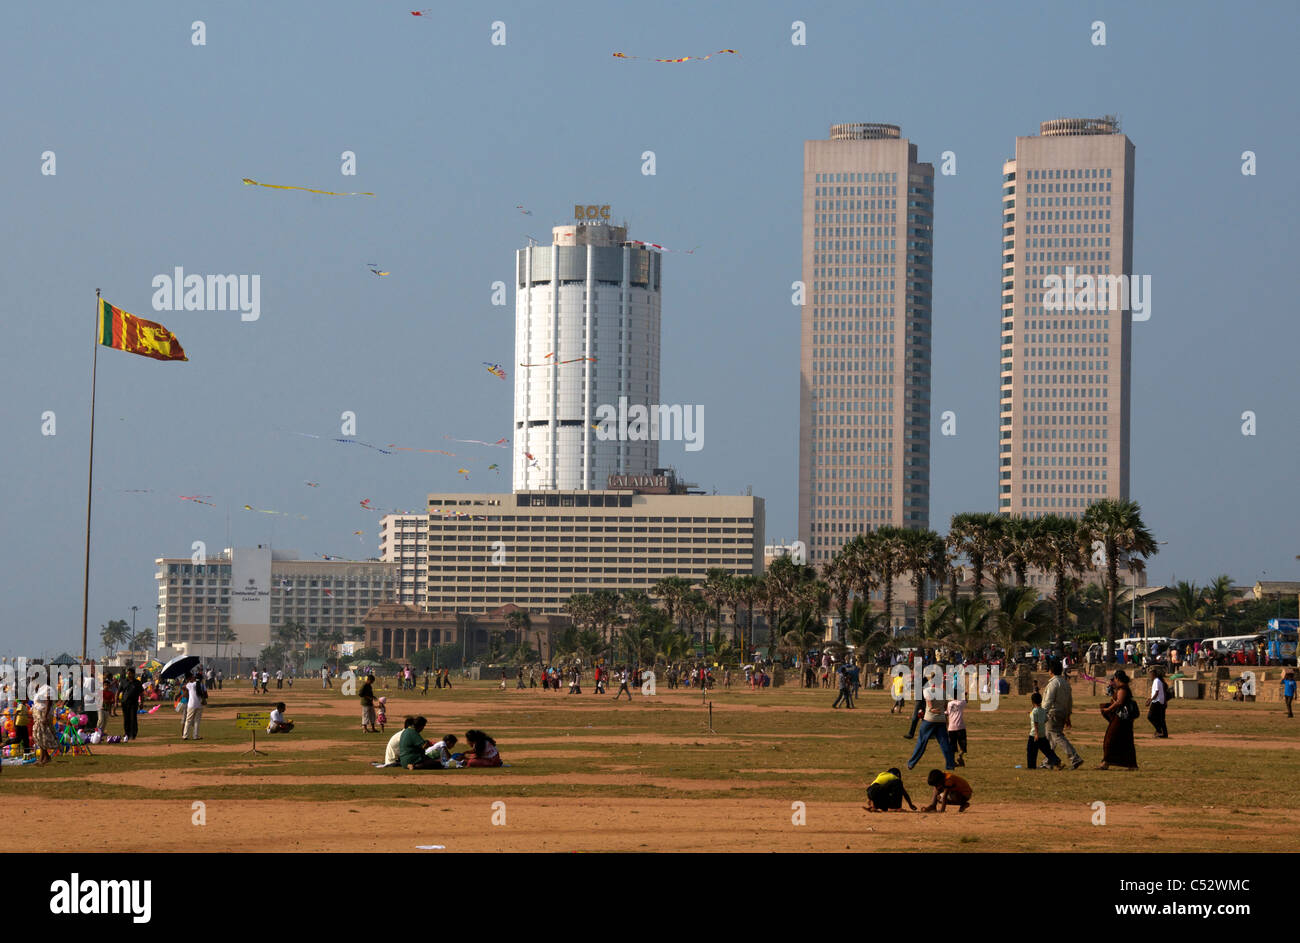 Cerfs-volistes Galle Face Green Colombo Sri Lanka Banque D'Images